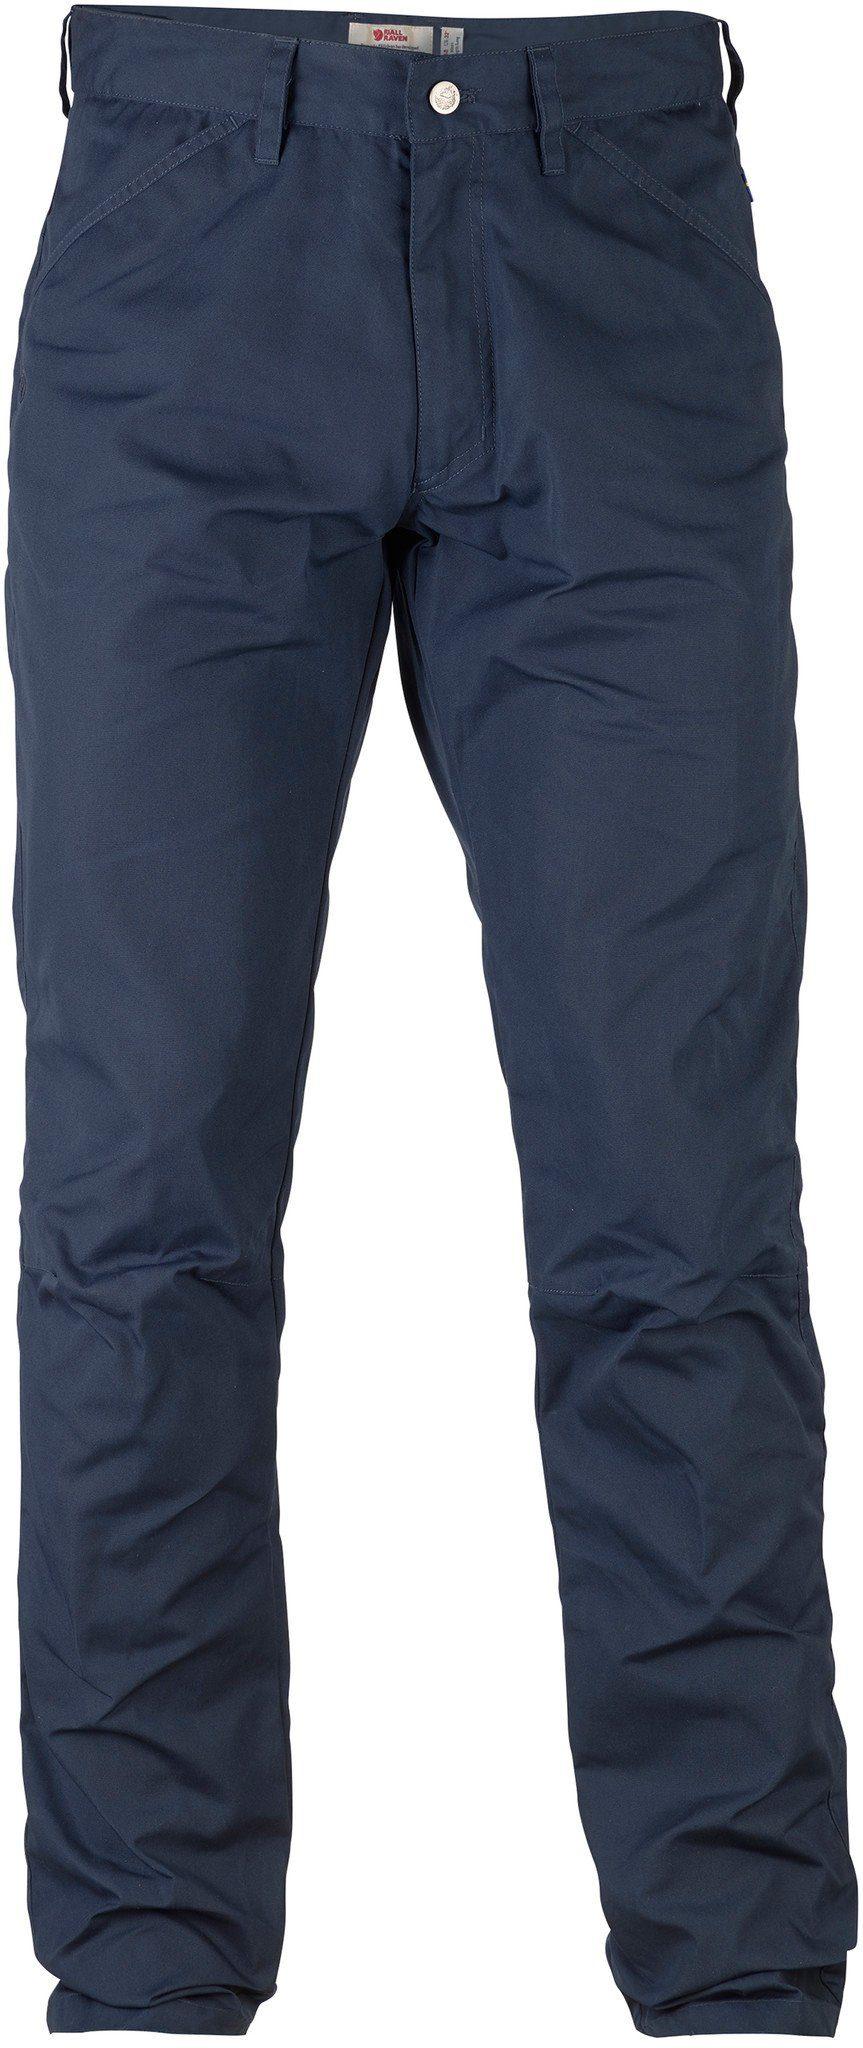 Fjällräven Outdoorhose »High Coast Fall Trousers Men«